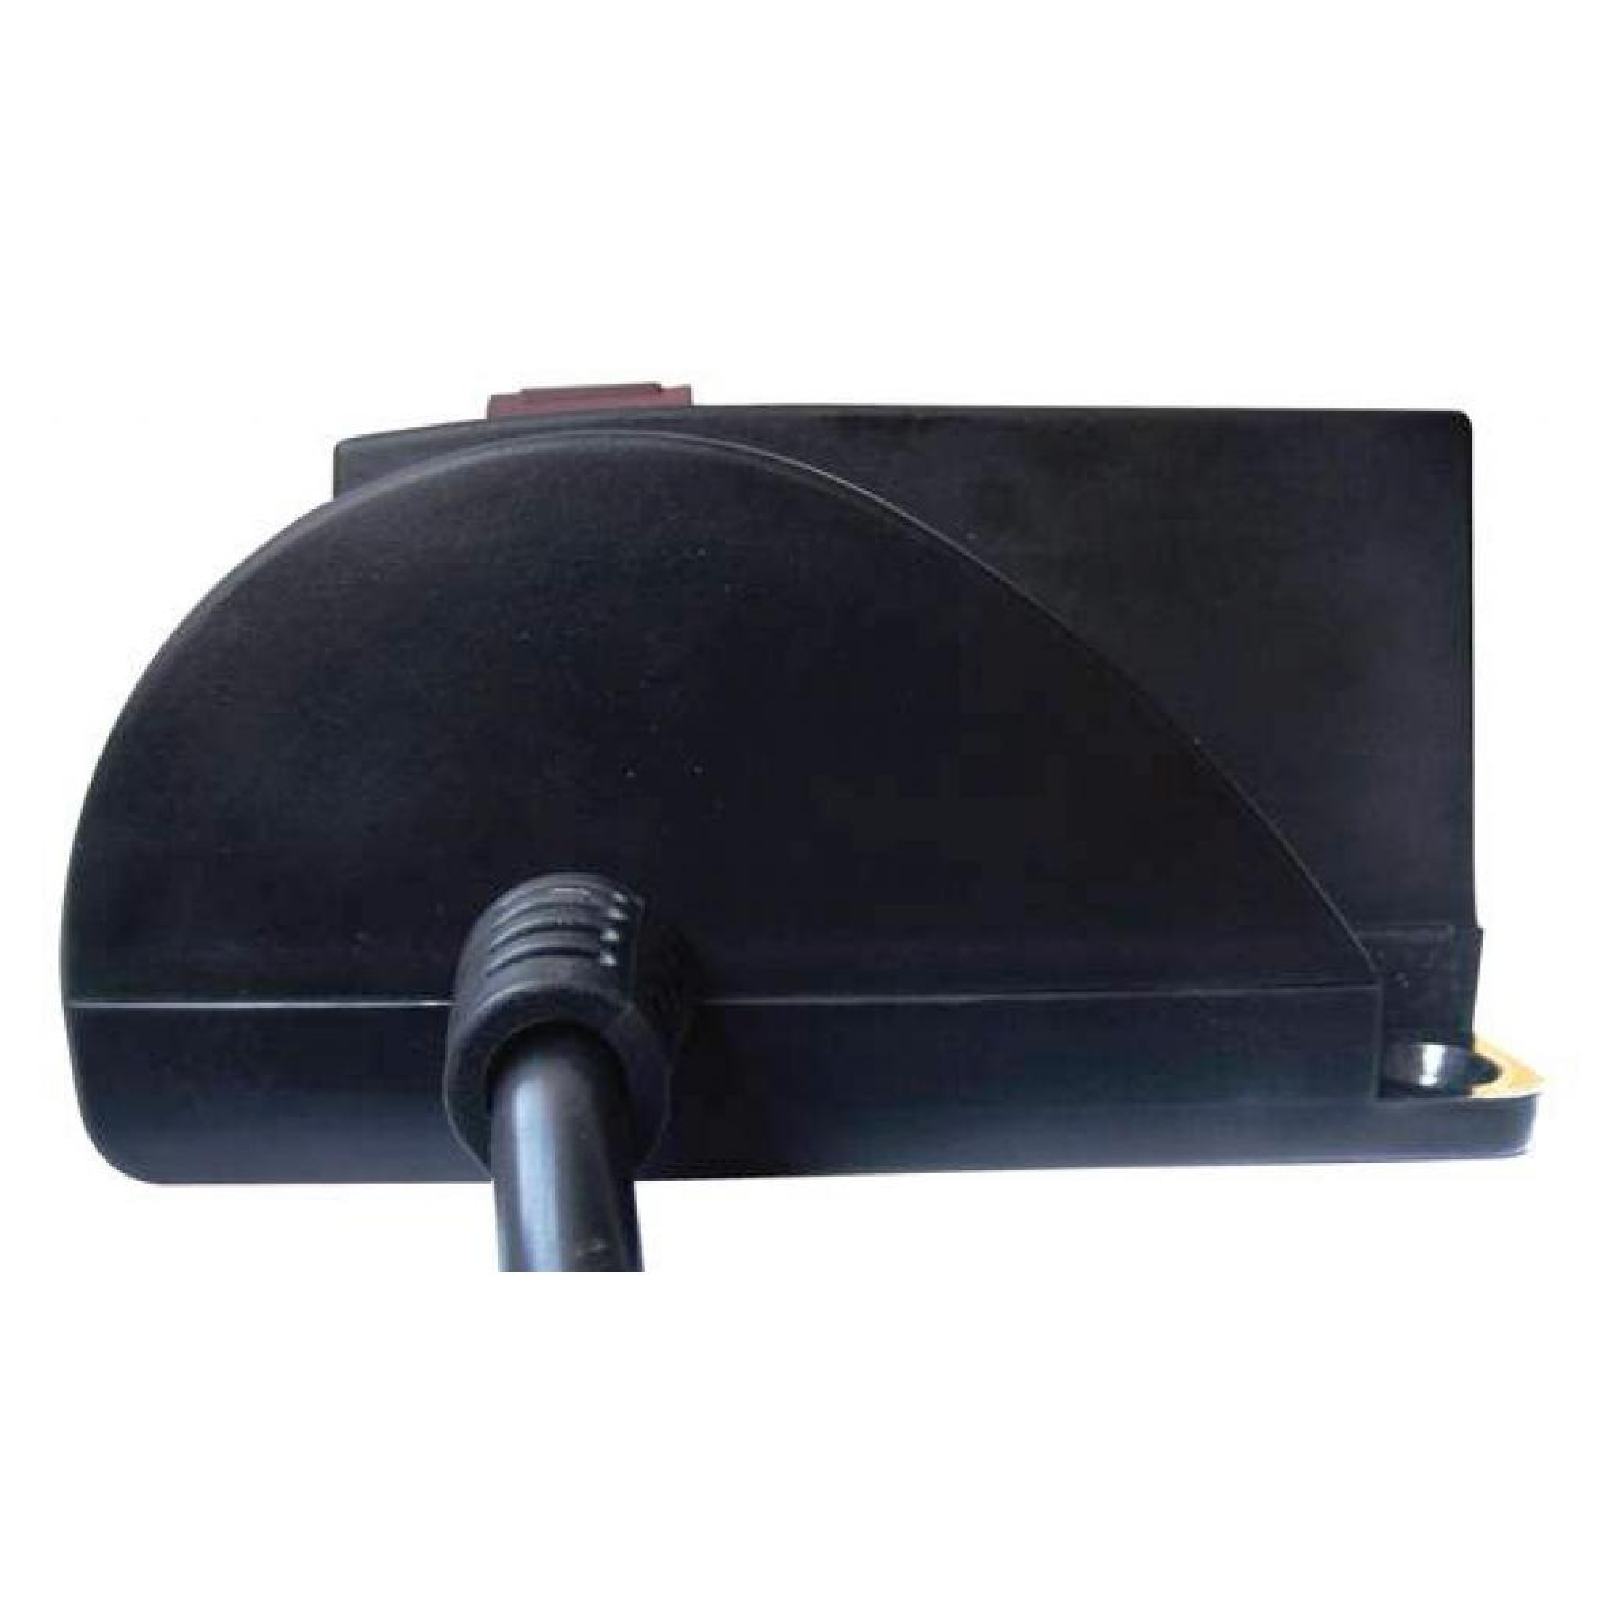 Сетевой фильтр питания EnerGenie 6 sockets, програмований з мережевим інтерфейсом (EG-PMS2-LAN) изображение 3